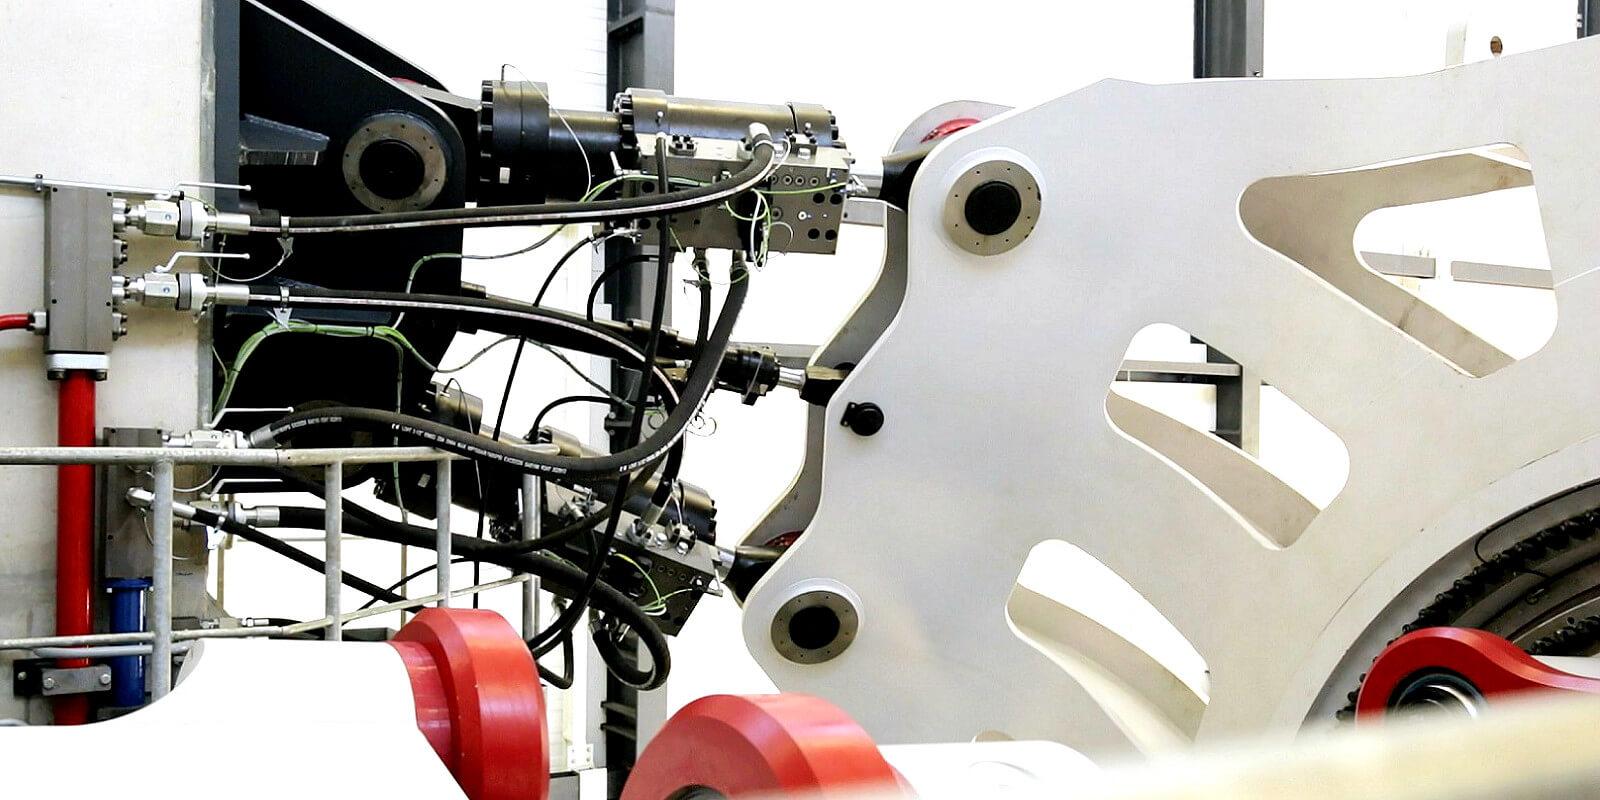 DyNaLab_Nacelle_Testing_Laboratory_Fraunhofer_IWES_Germany_Idom__0_